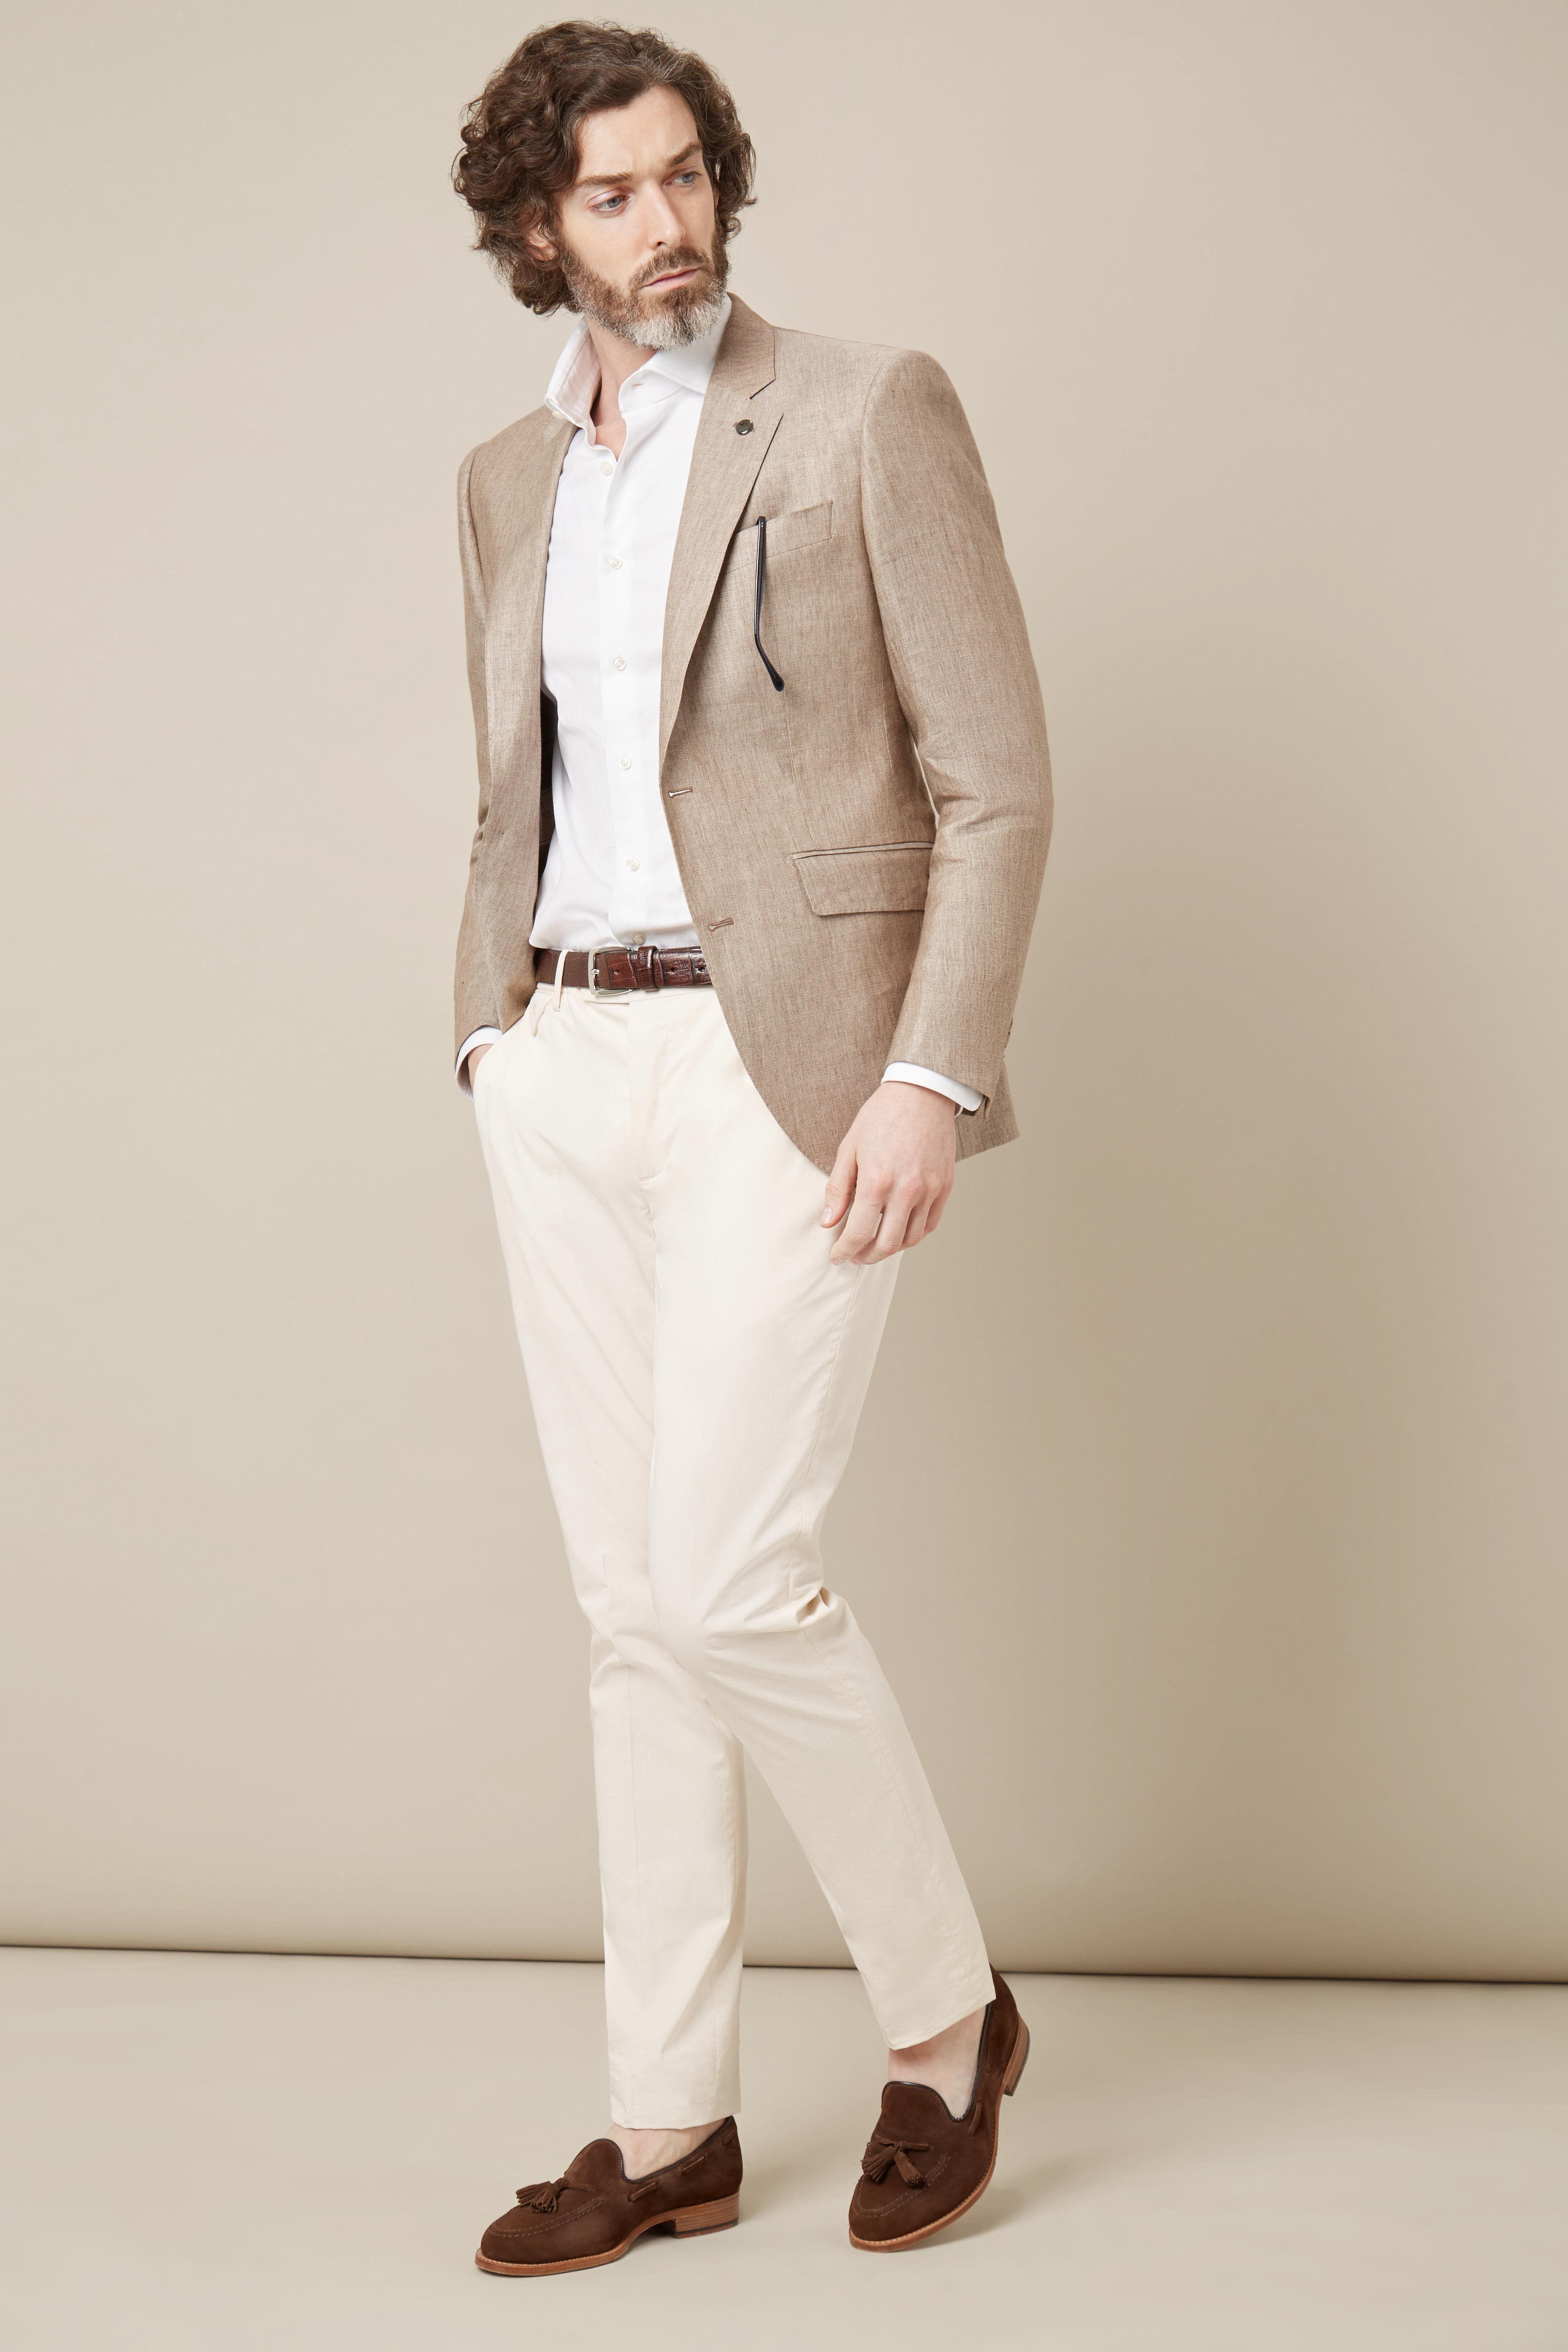 Mayfair Veste En Tissage Clothing Lin Blazers Hackett Chevrons 5vFqFHzc